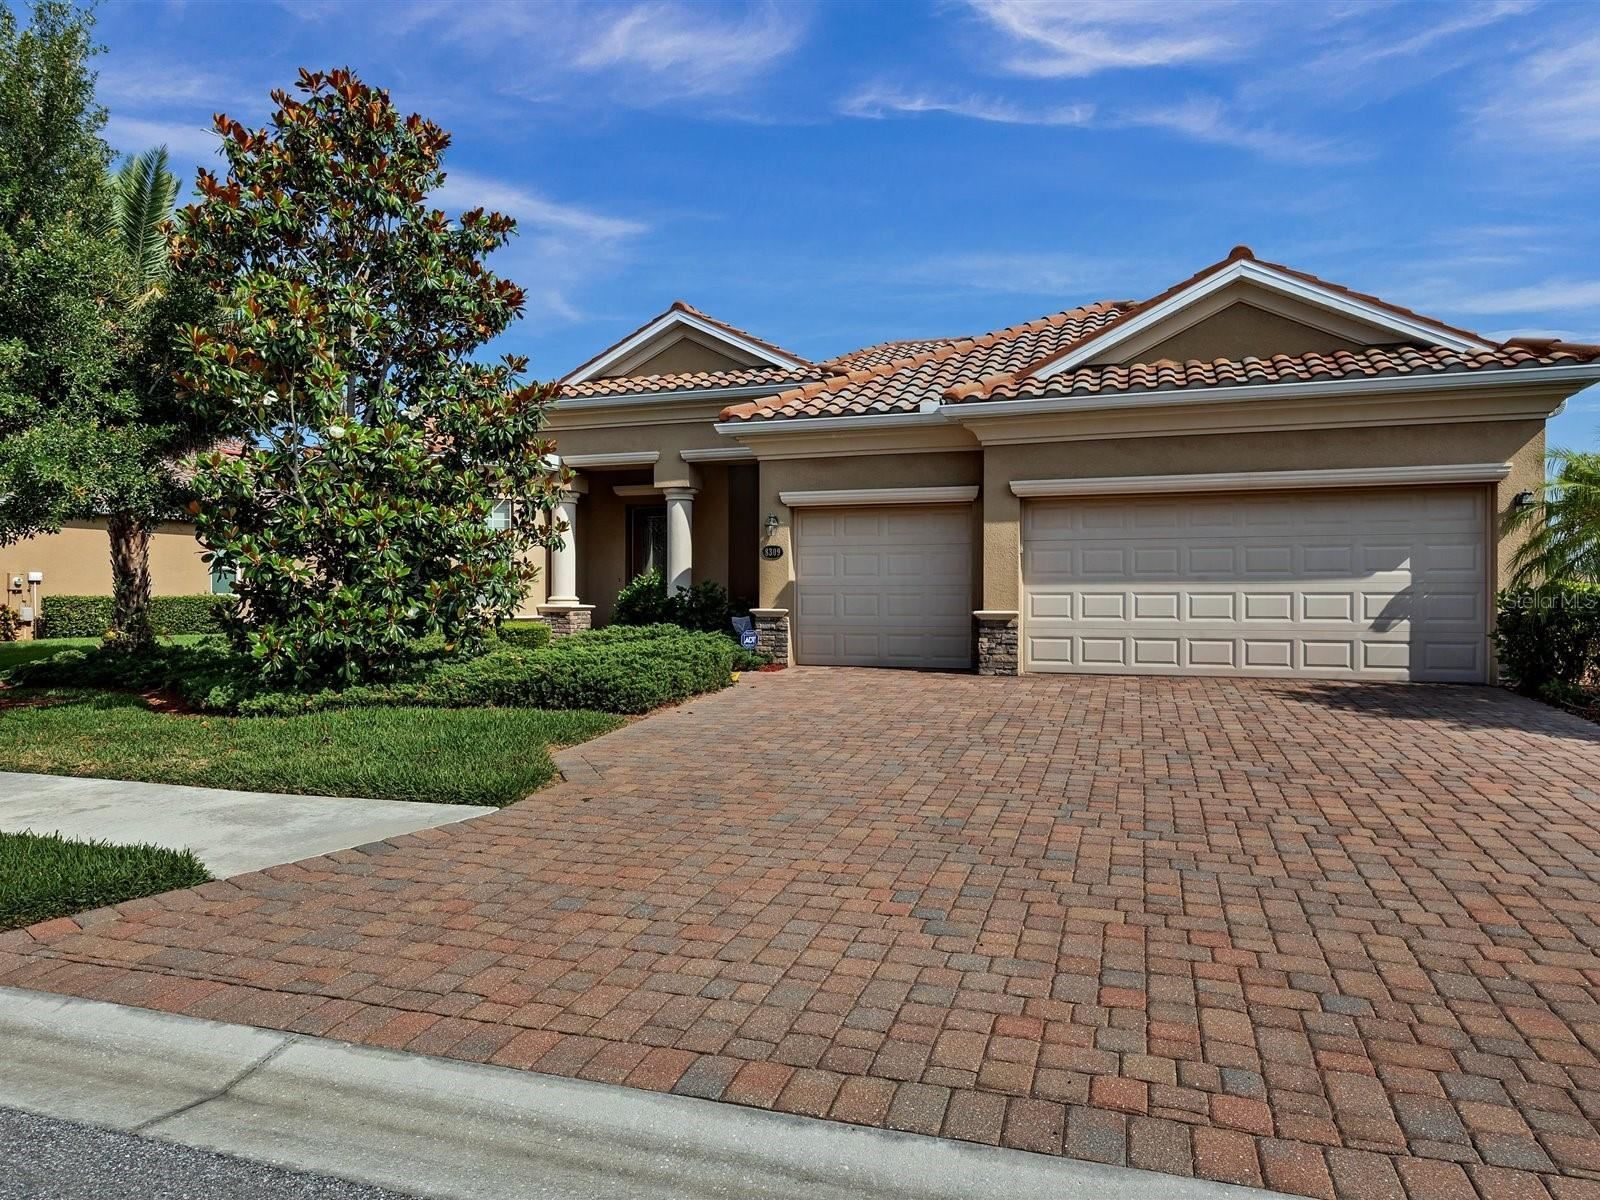 8309 HERITAGE GRAND PLACE, Bradenton, FL 34212 - MLS#: A4499664